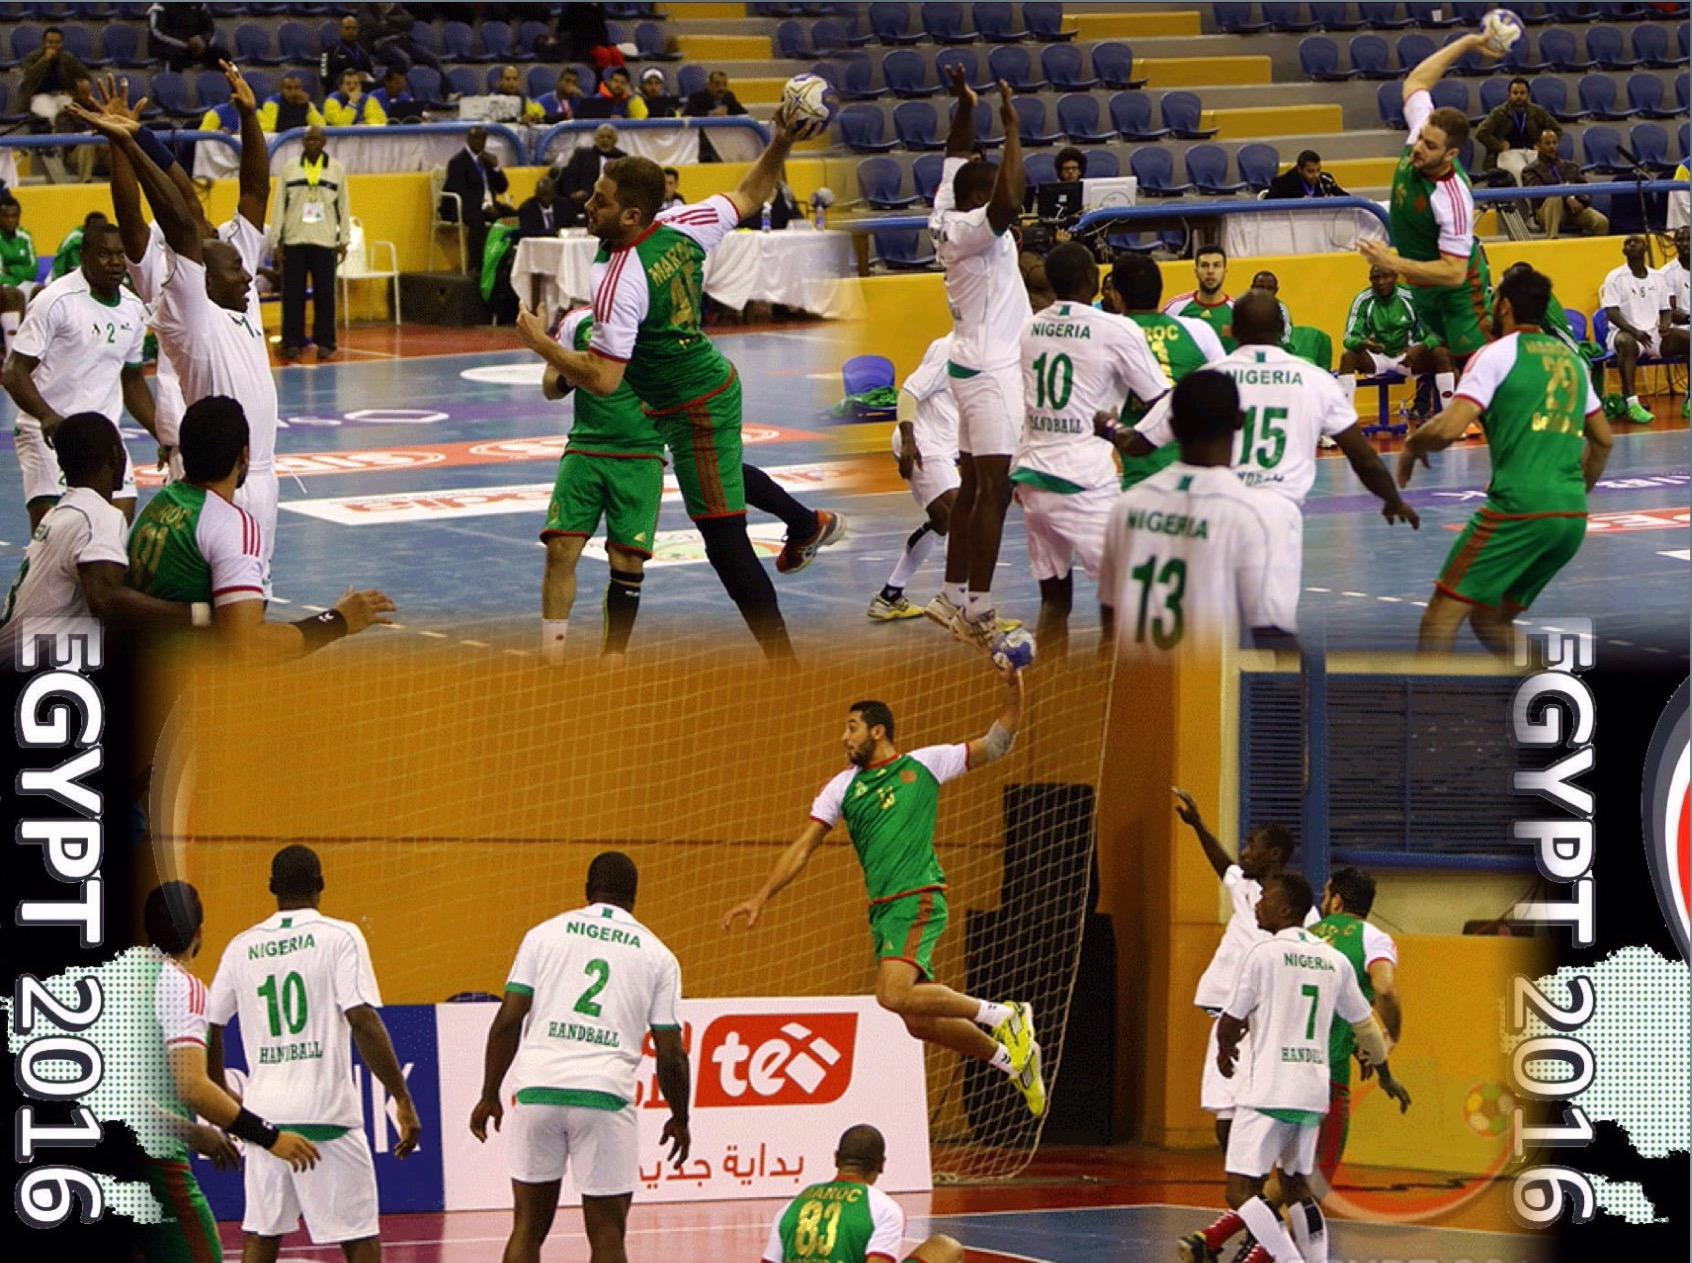 Handball AFCON: Nigeria Lose Third Match Vs Morocco